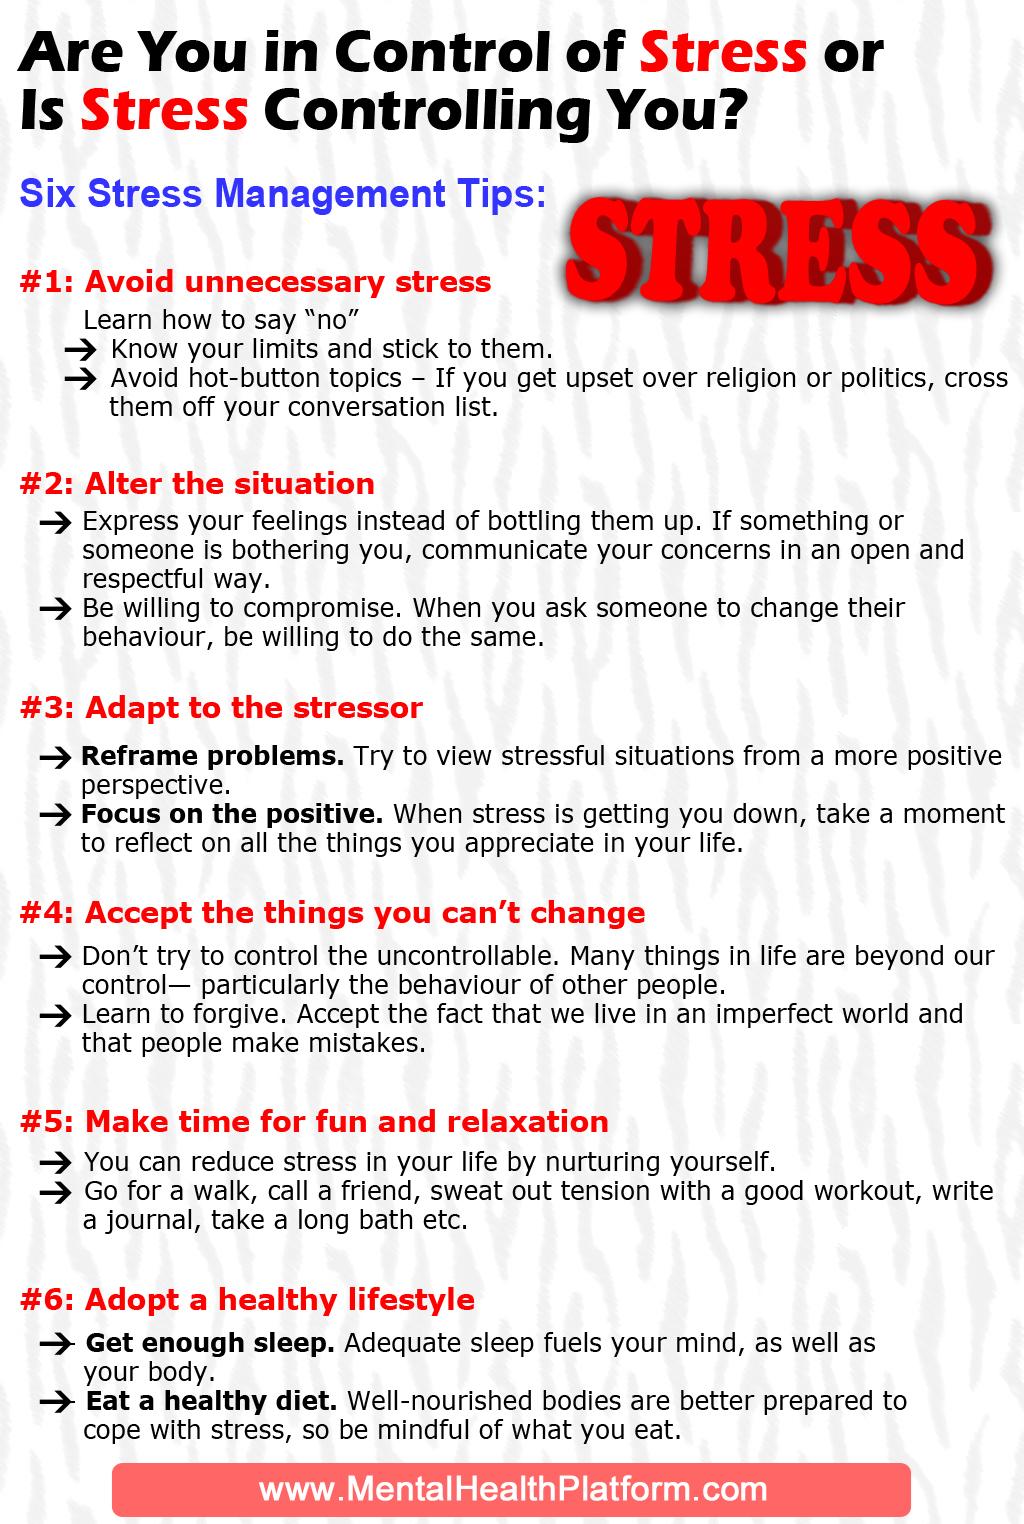 Six Stress Management Tips